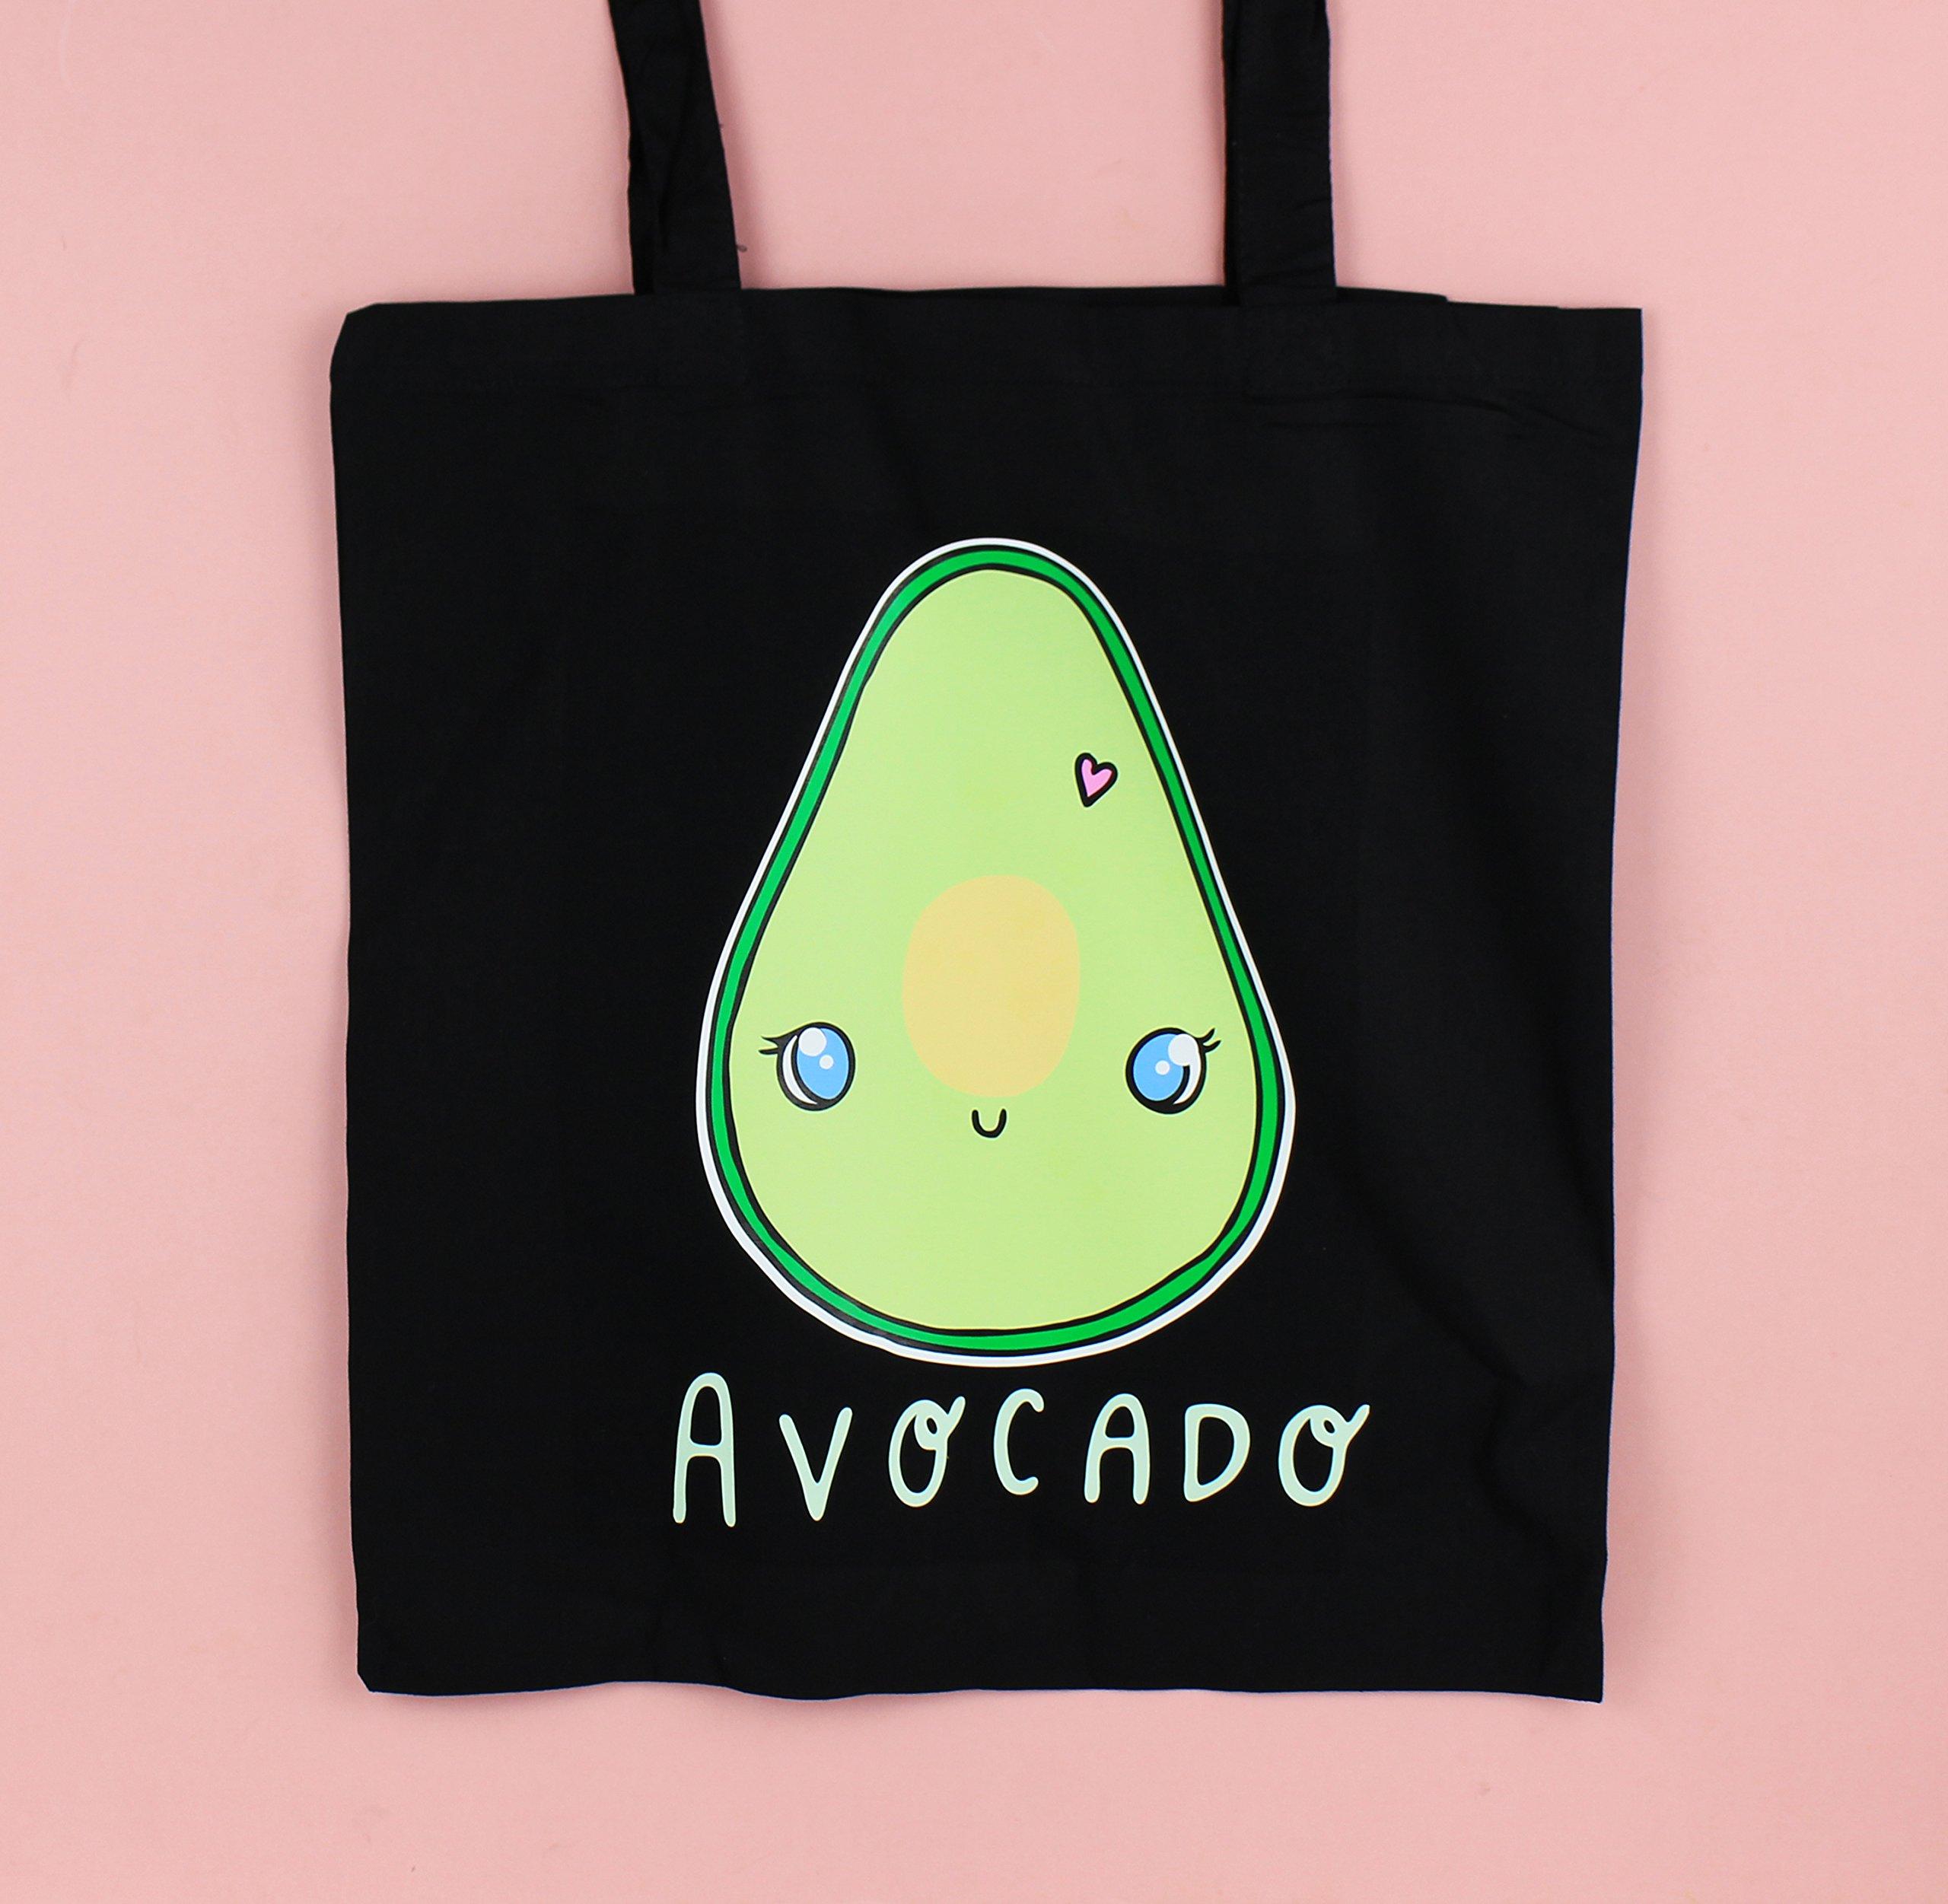 Avocado Tote Bag - handmade-bags